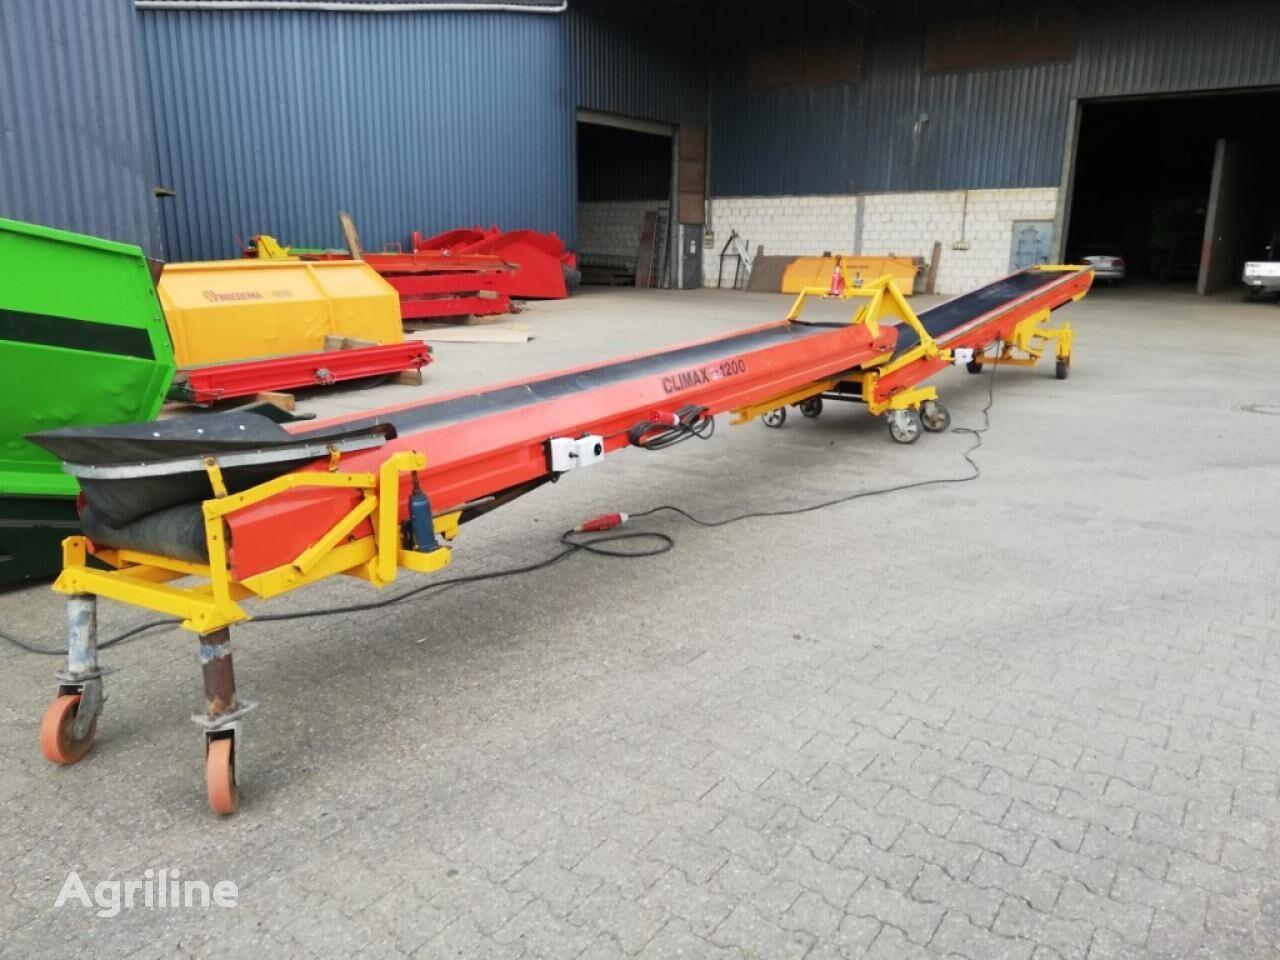 CLIMAX Teleskopband CDVE 1200 agricultural conveyor